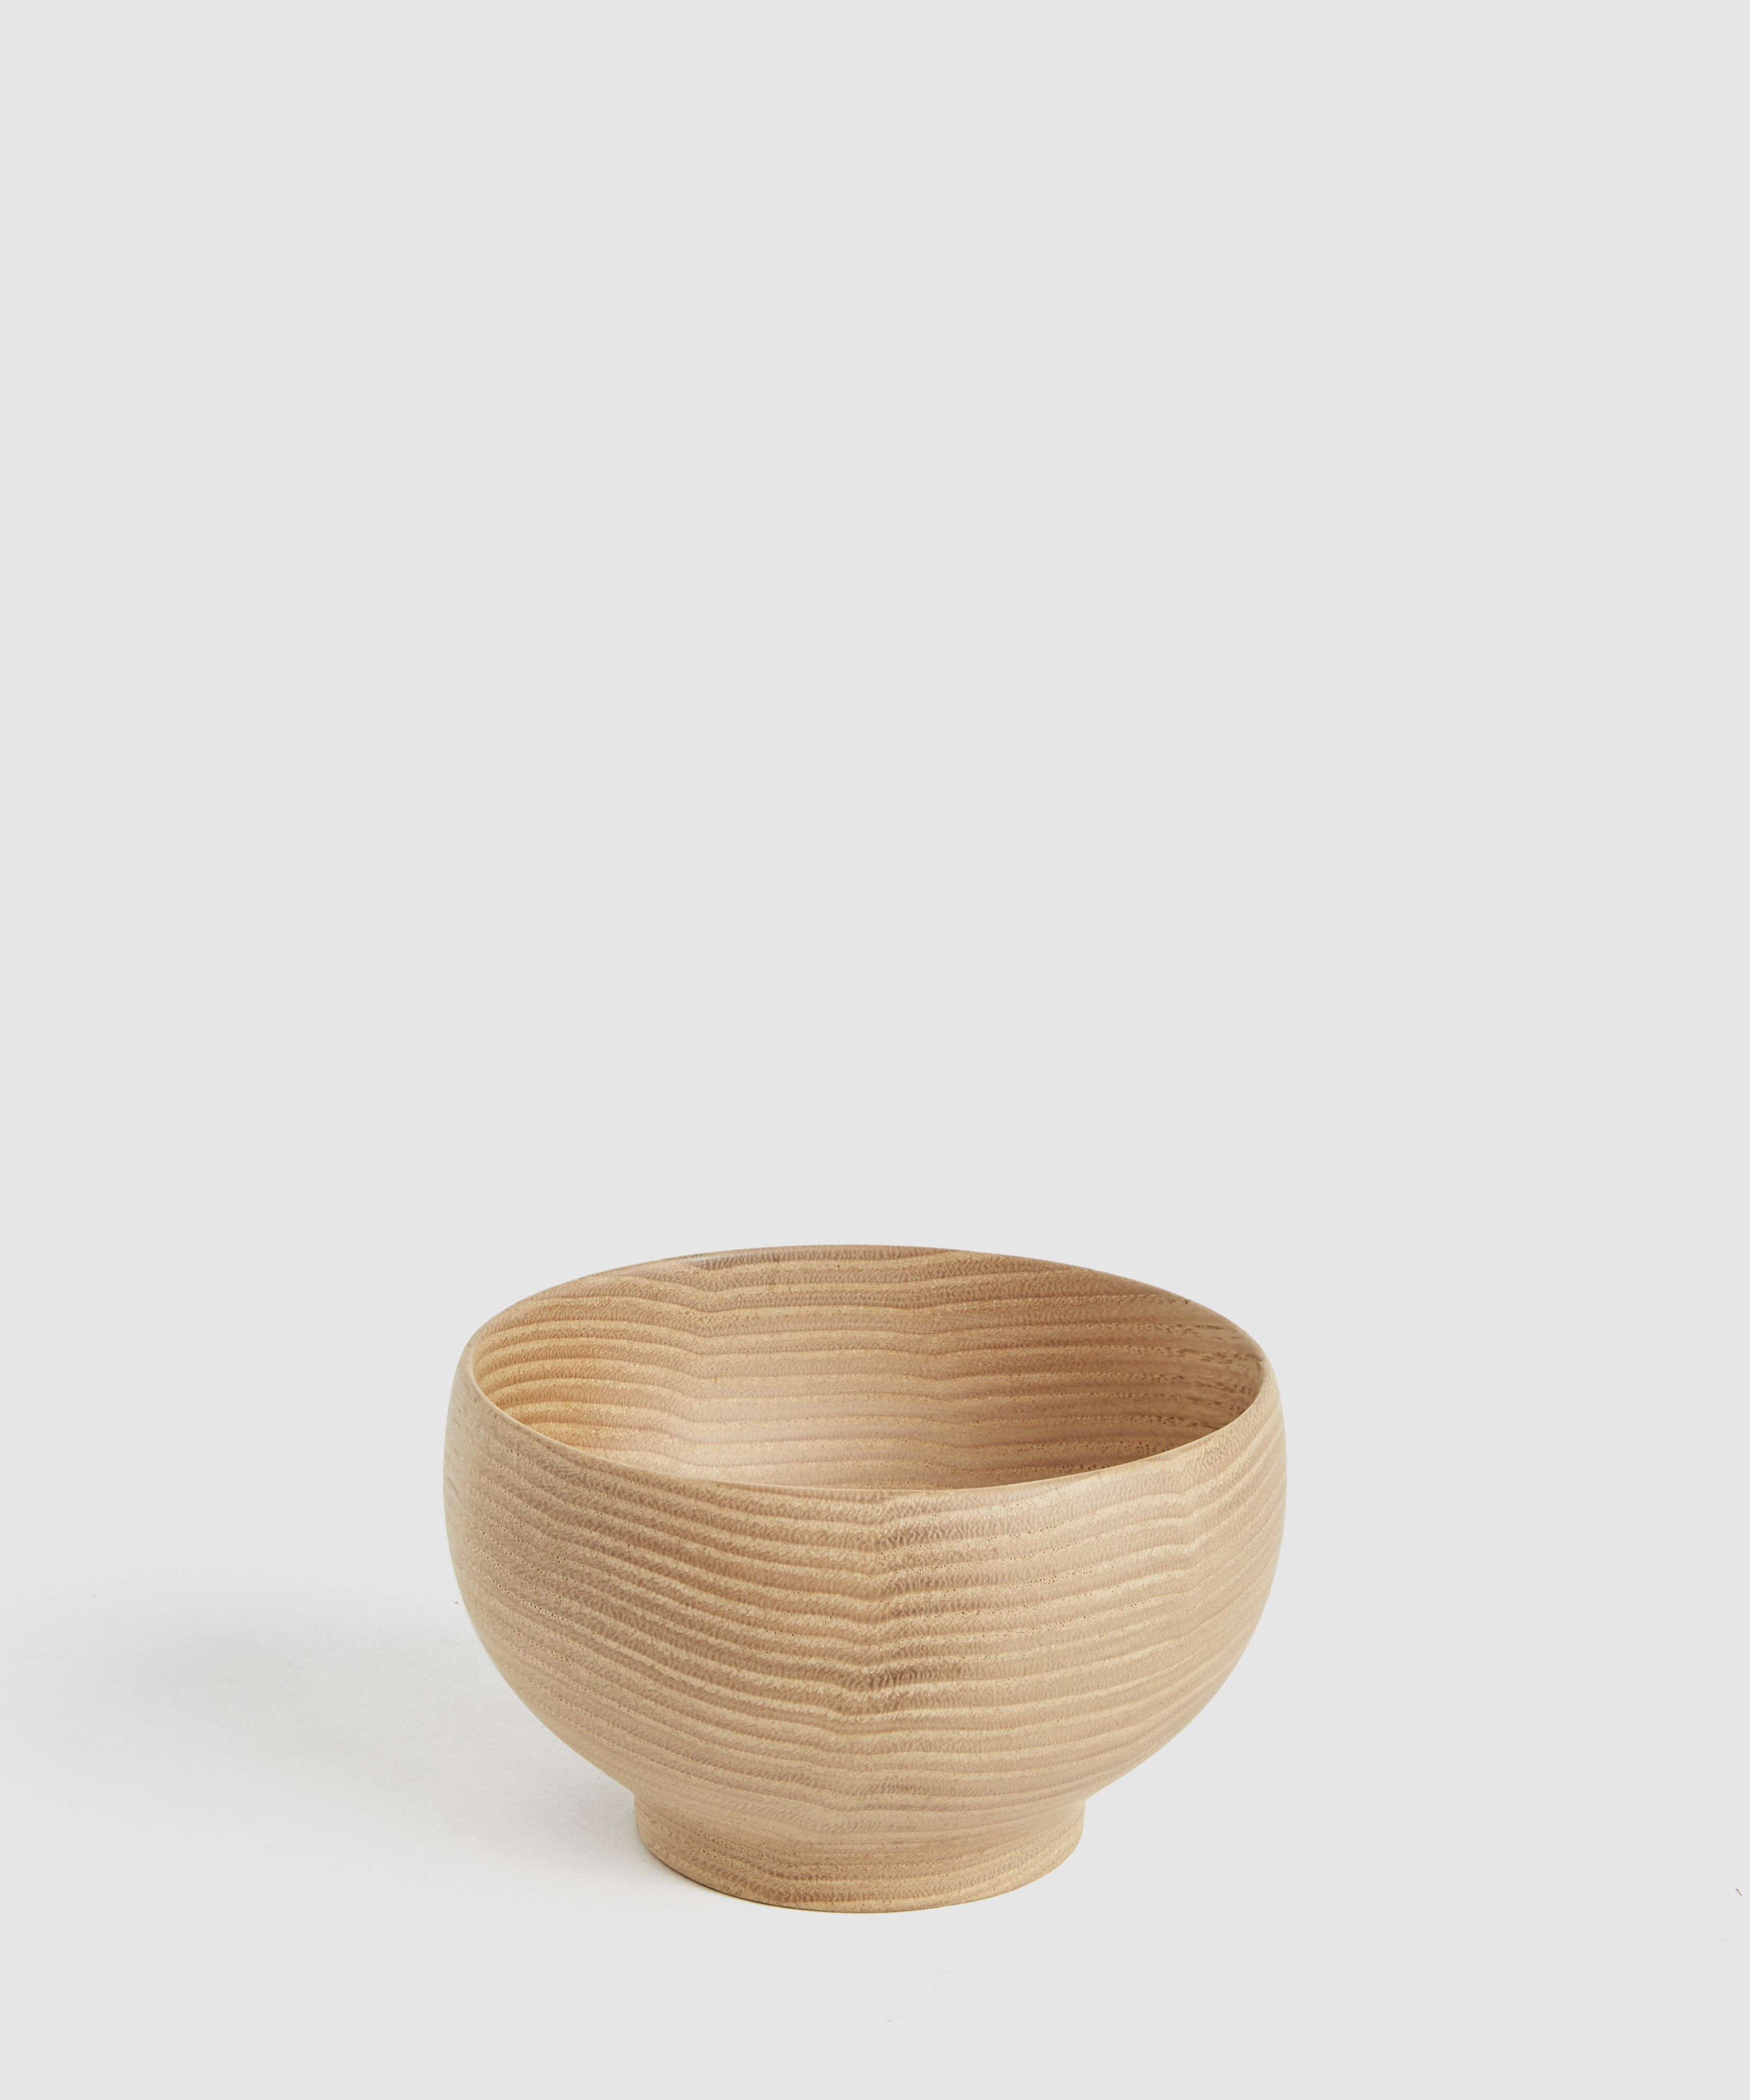 Photo of Handmade Japanese Chestnut Cozy Bowl